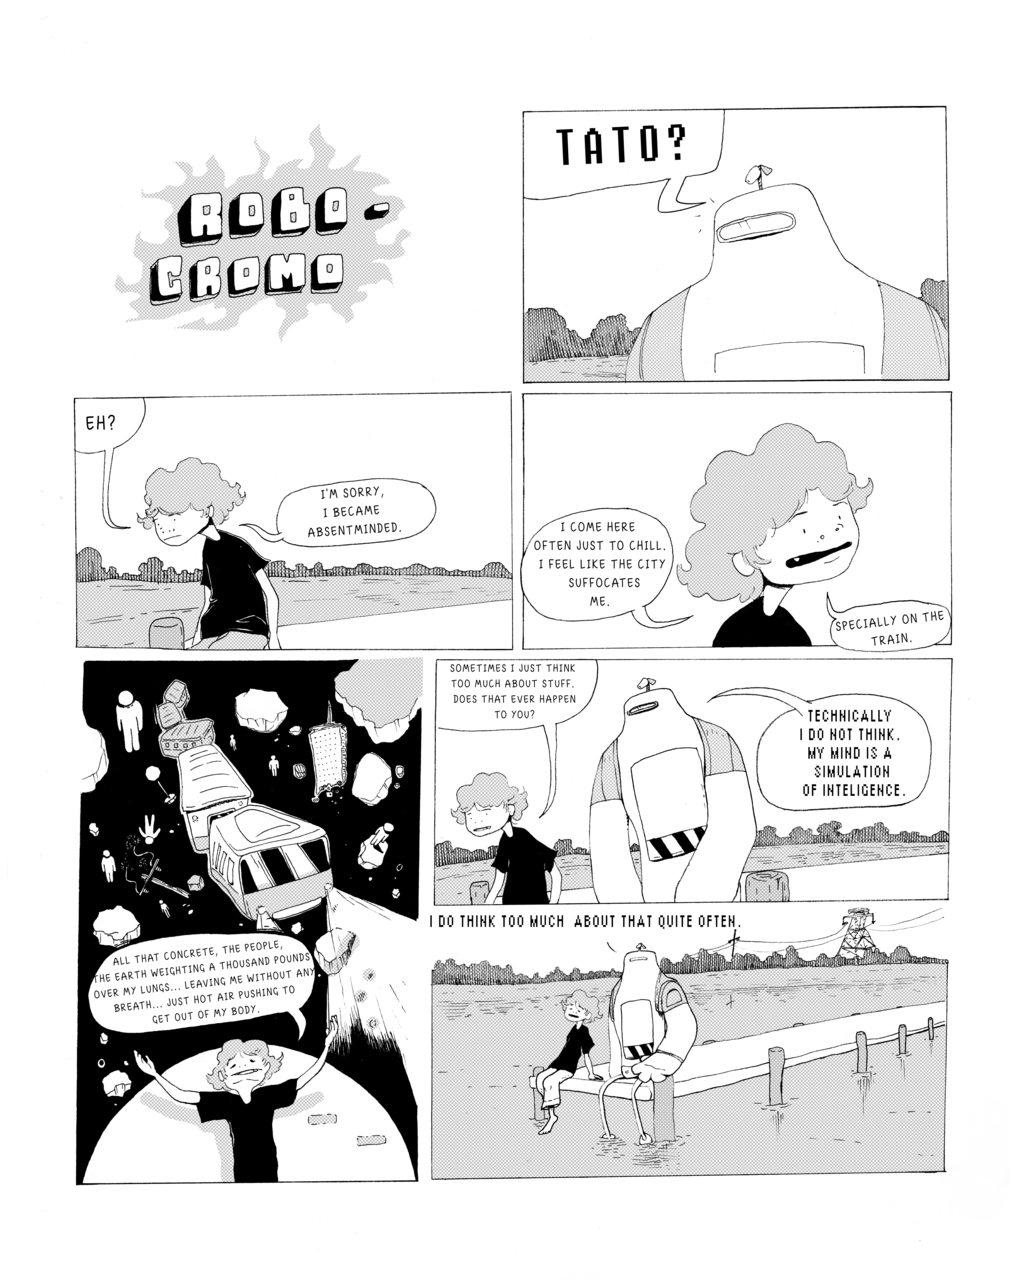 robocromo_page_1_by_recedebo-d7gslju (1).png